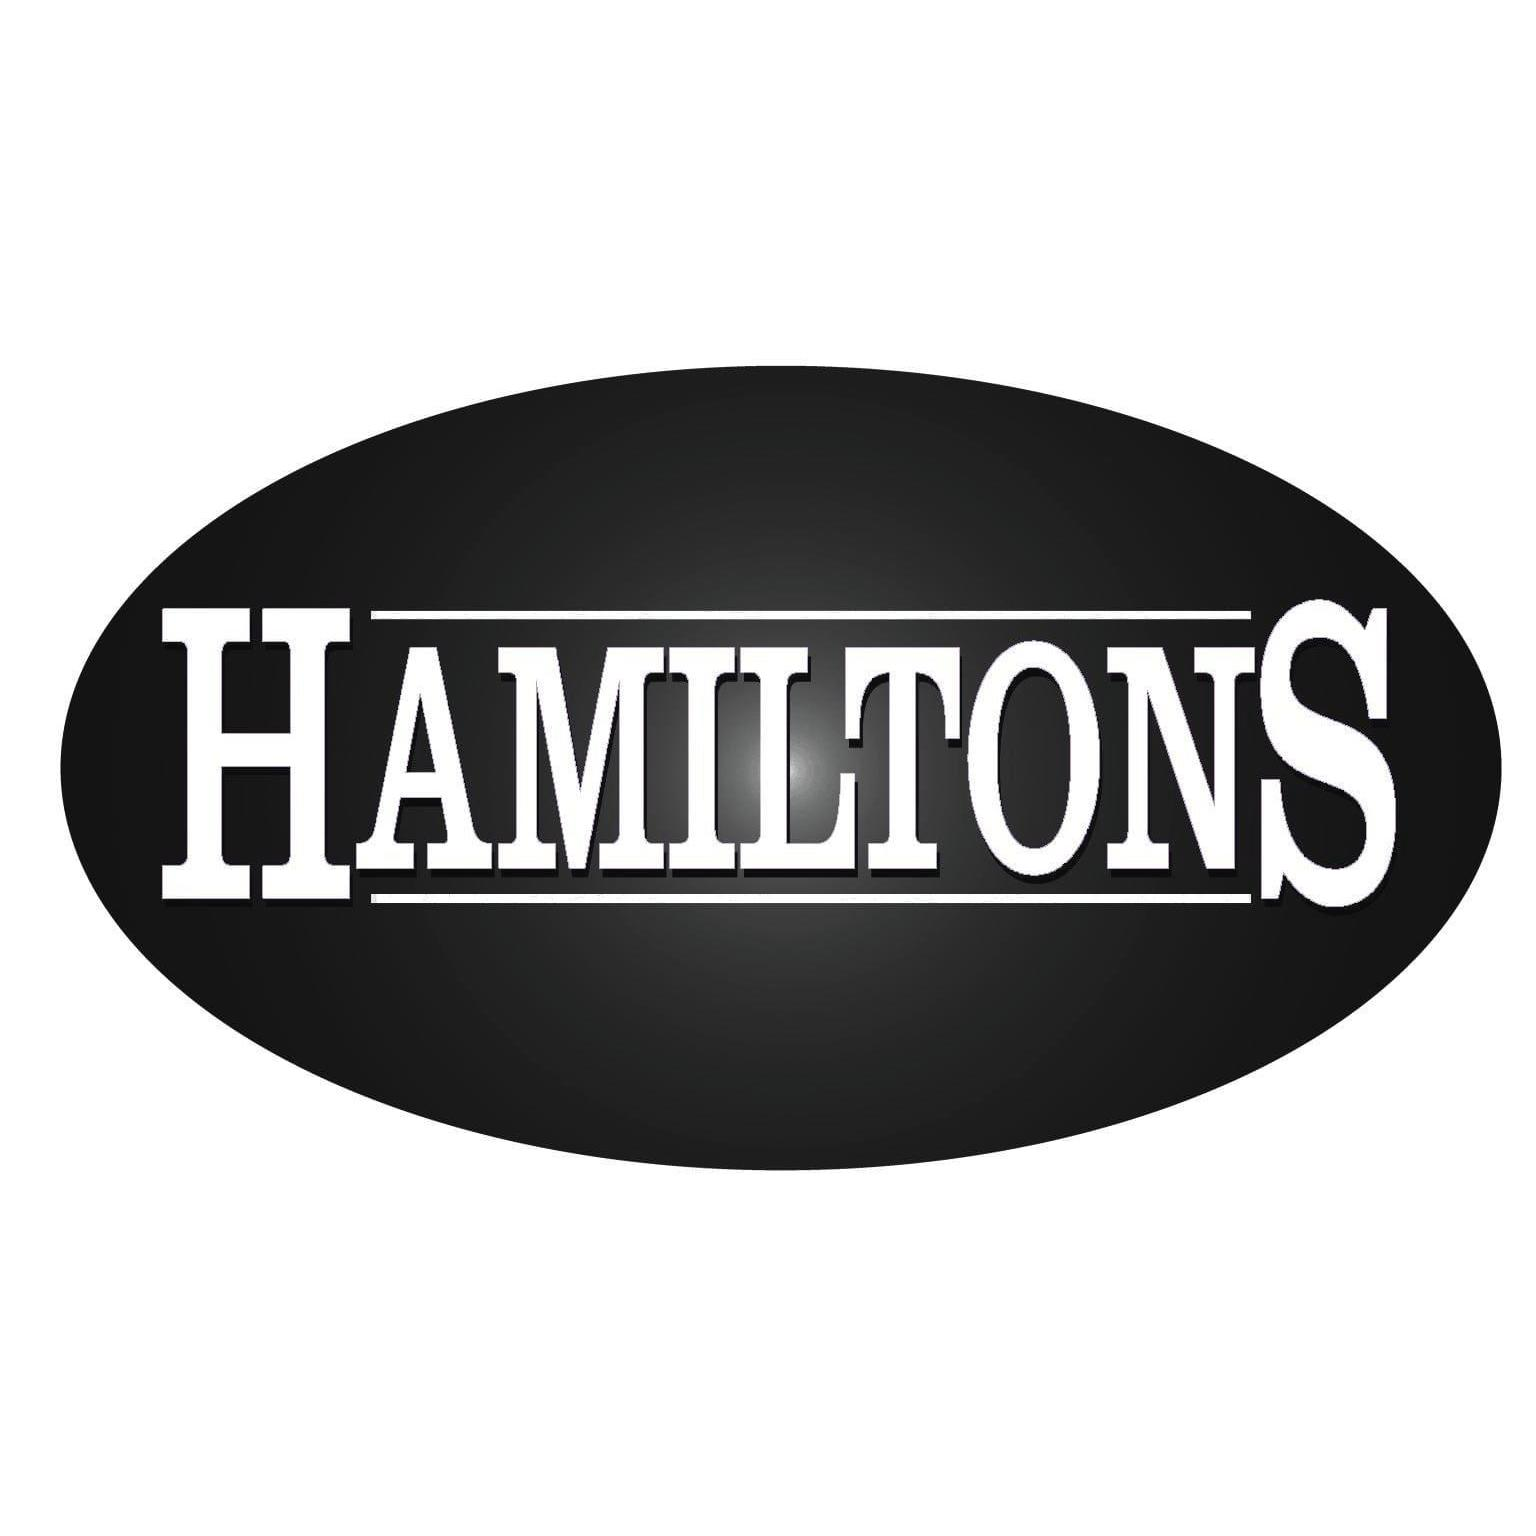 Hamiltons Furniture Centre - Shipley, West Yorkshire BD18 3HN - 01274 587700 | ShowMeLocal.com